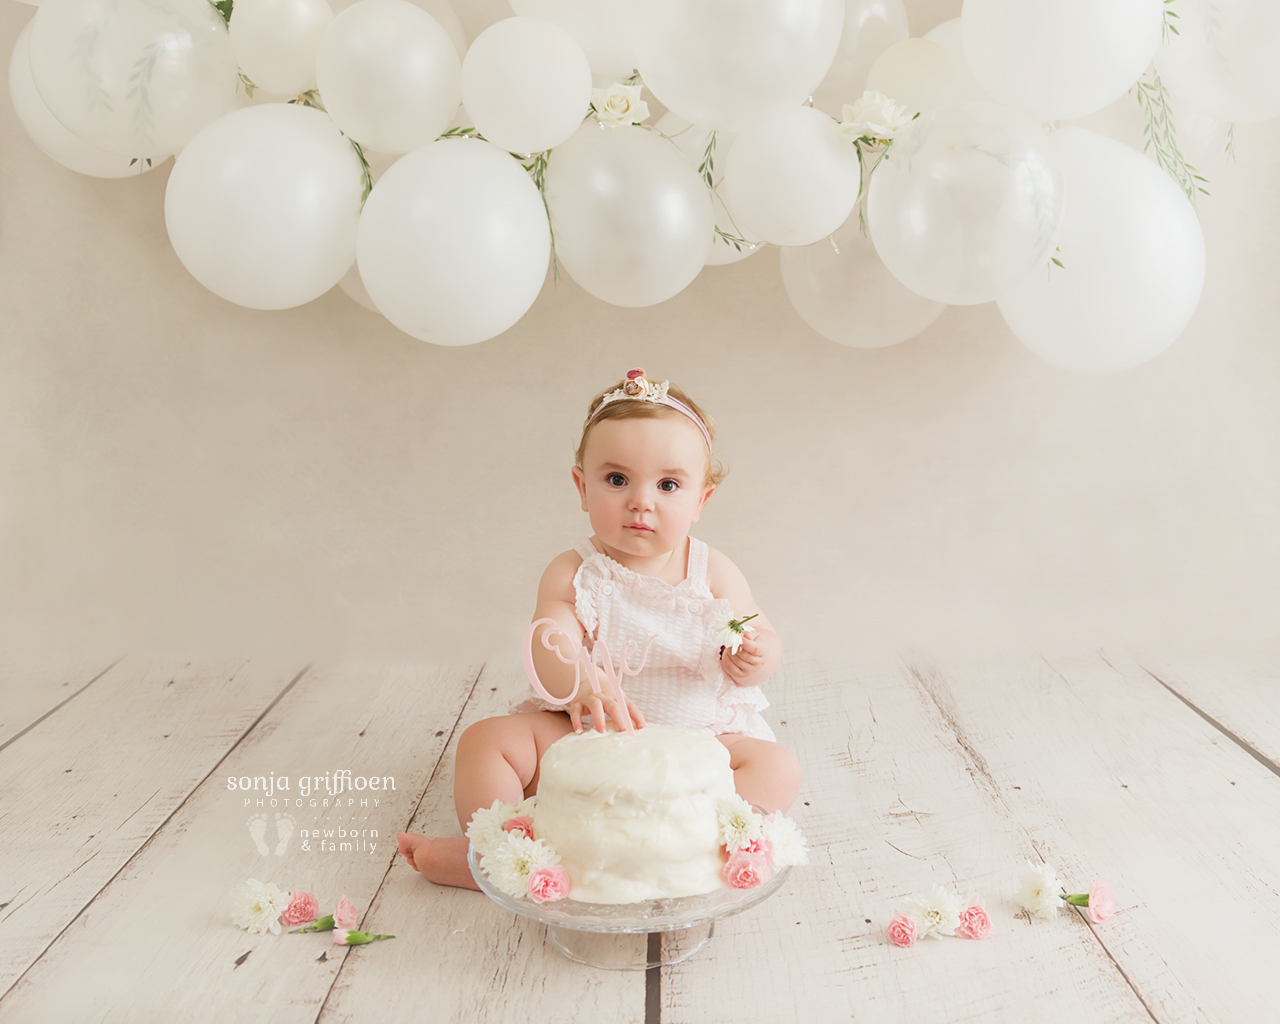 Vivienne-Cake-Smash-Brisbane-Baby-Photographer-Sonja-Griffioen-02.jpg